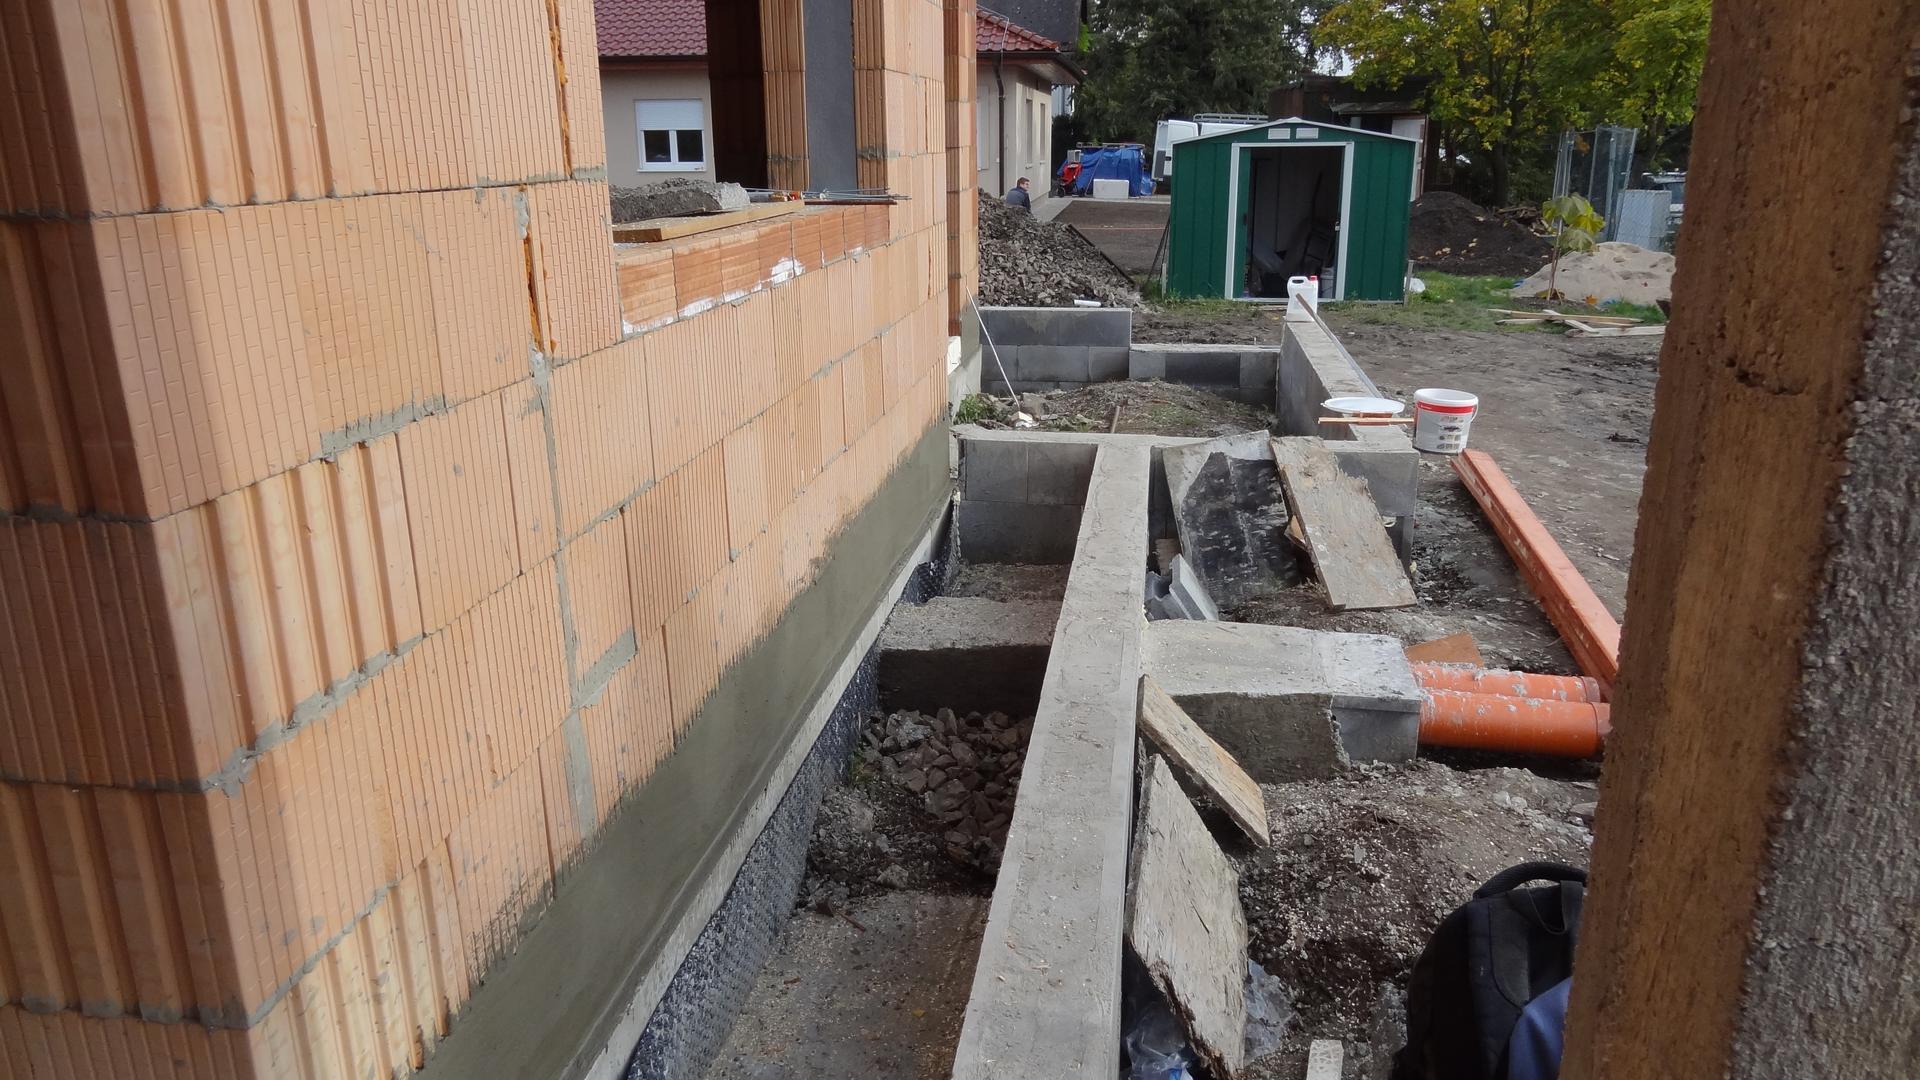 Stavba domečku pokračuje - Slunečná teráska